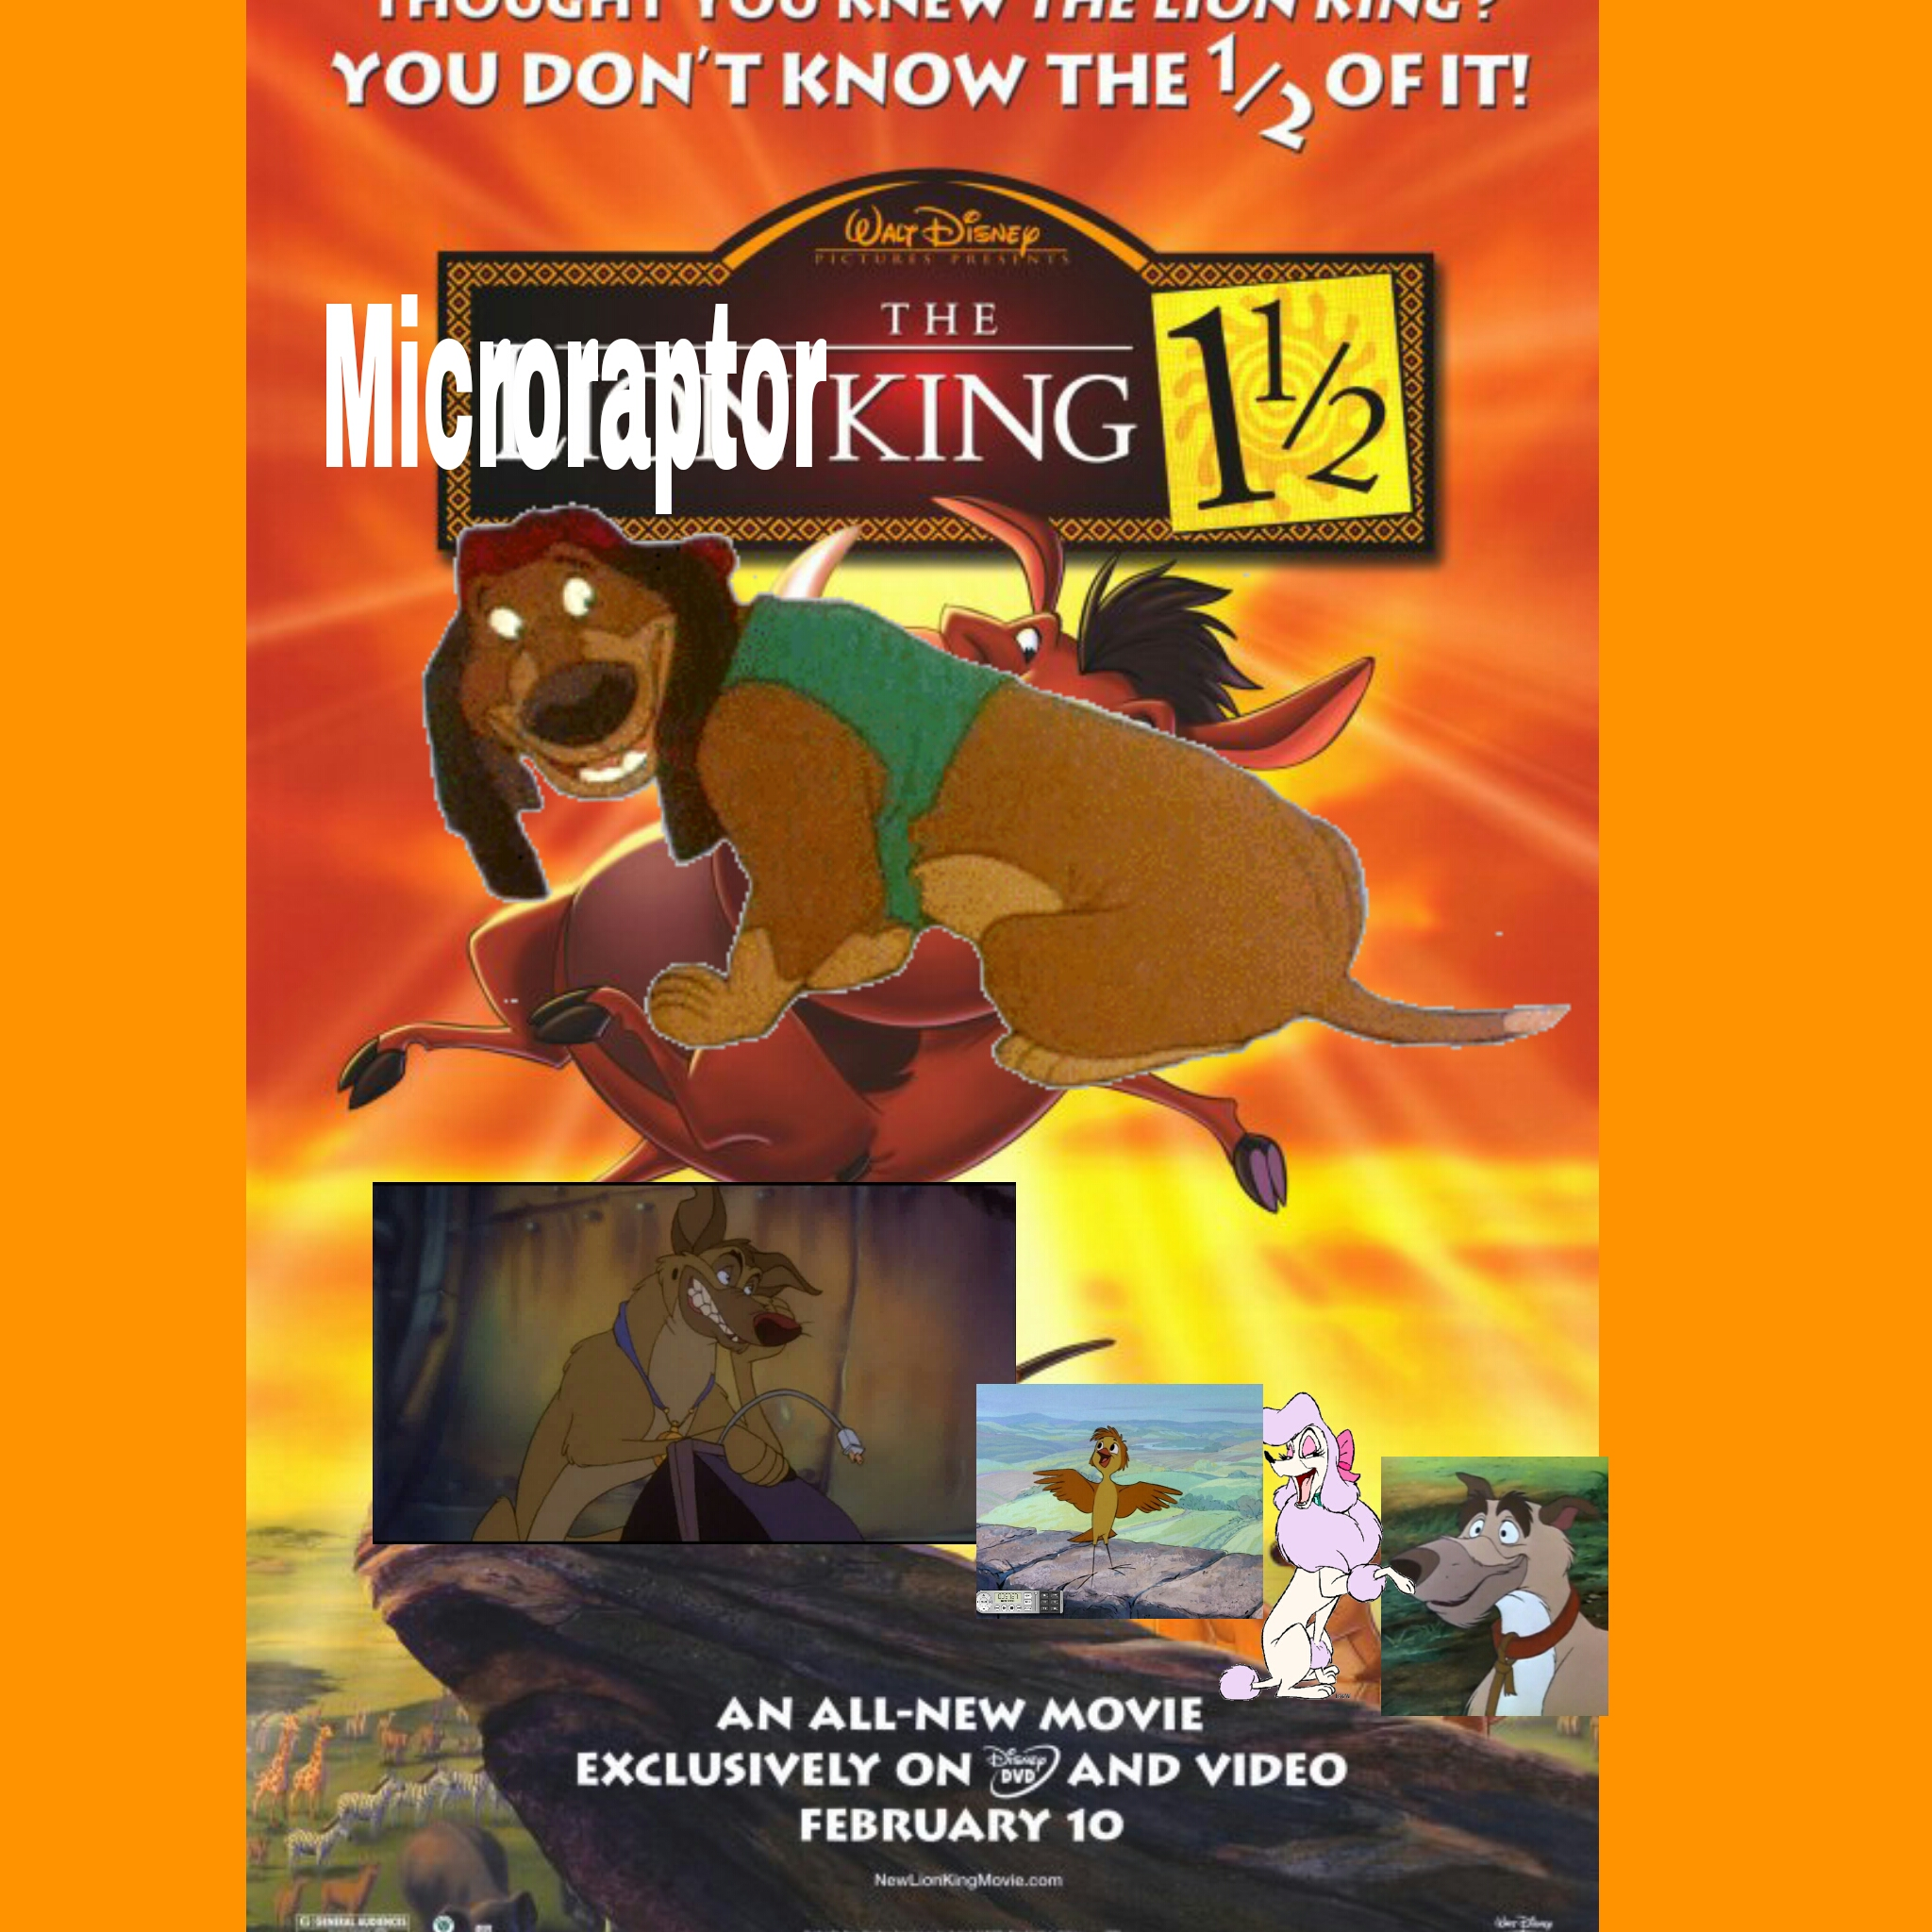 The Microraptor King 11/2